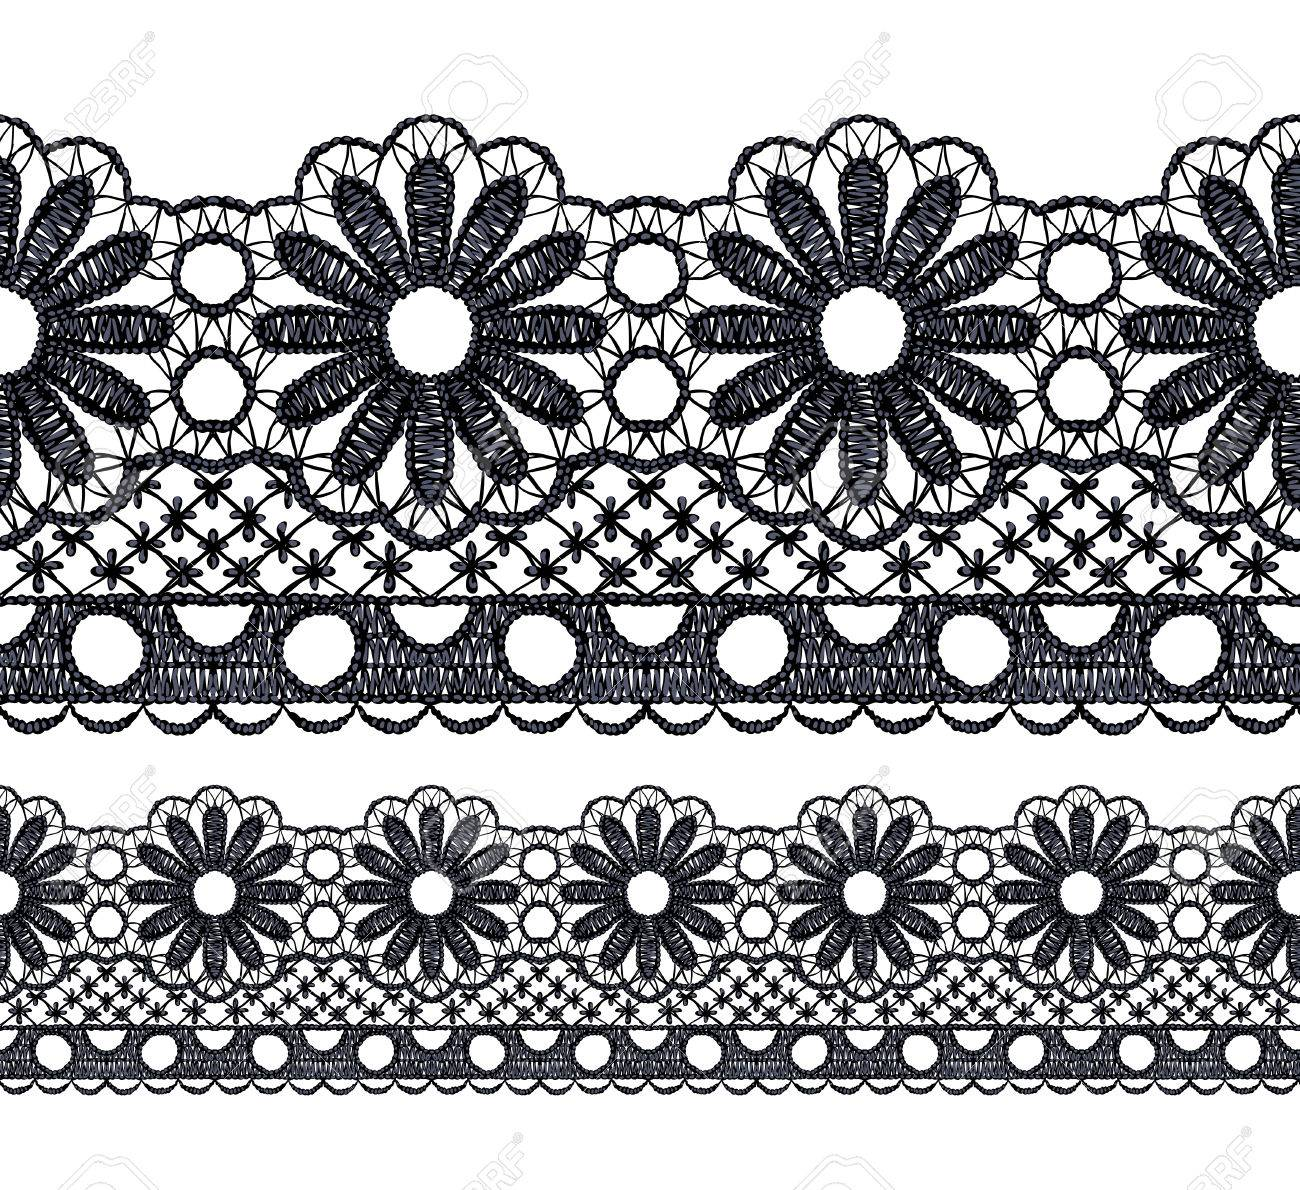 Seamless penwork lace border Realistic illustration. Stock Vector - 22420819